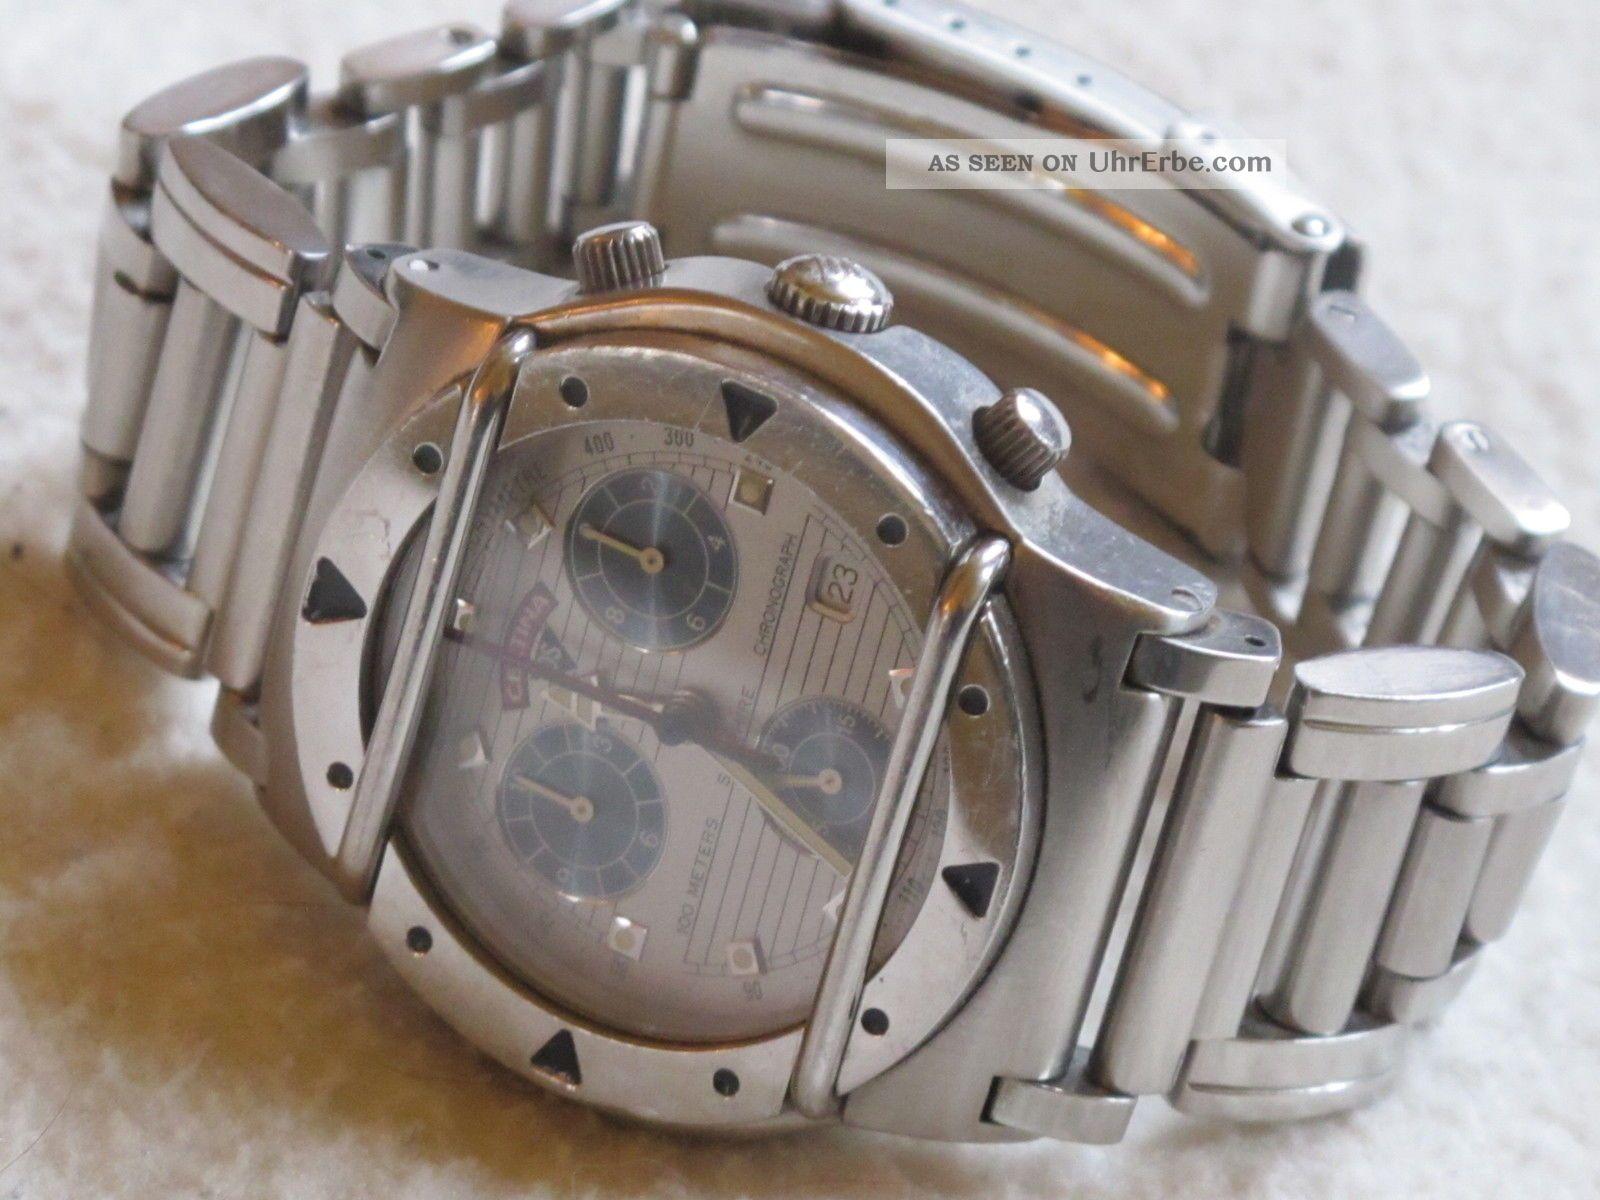 Certina Ds Cascadeur,  Chronograph,  Sehr Selten,  Retro Armbanduhren Bild